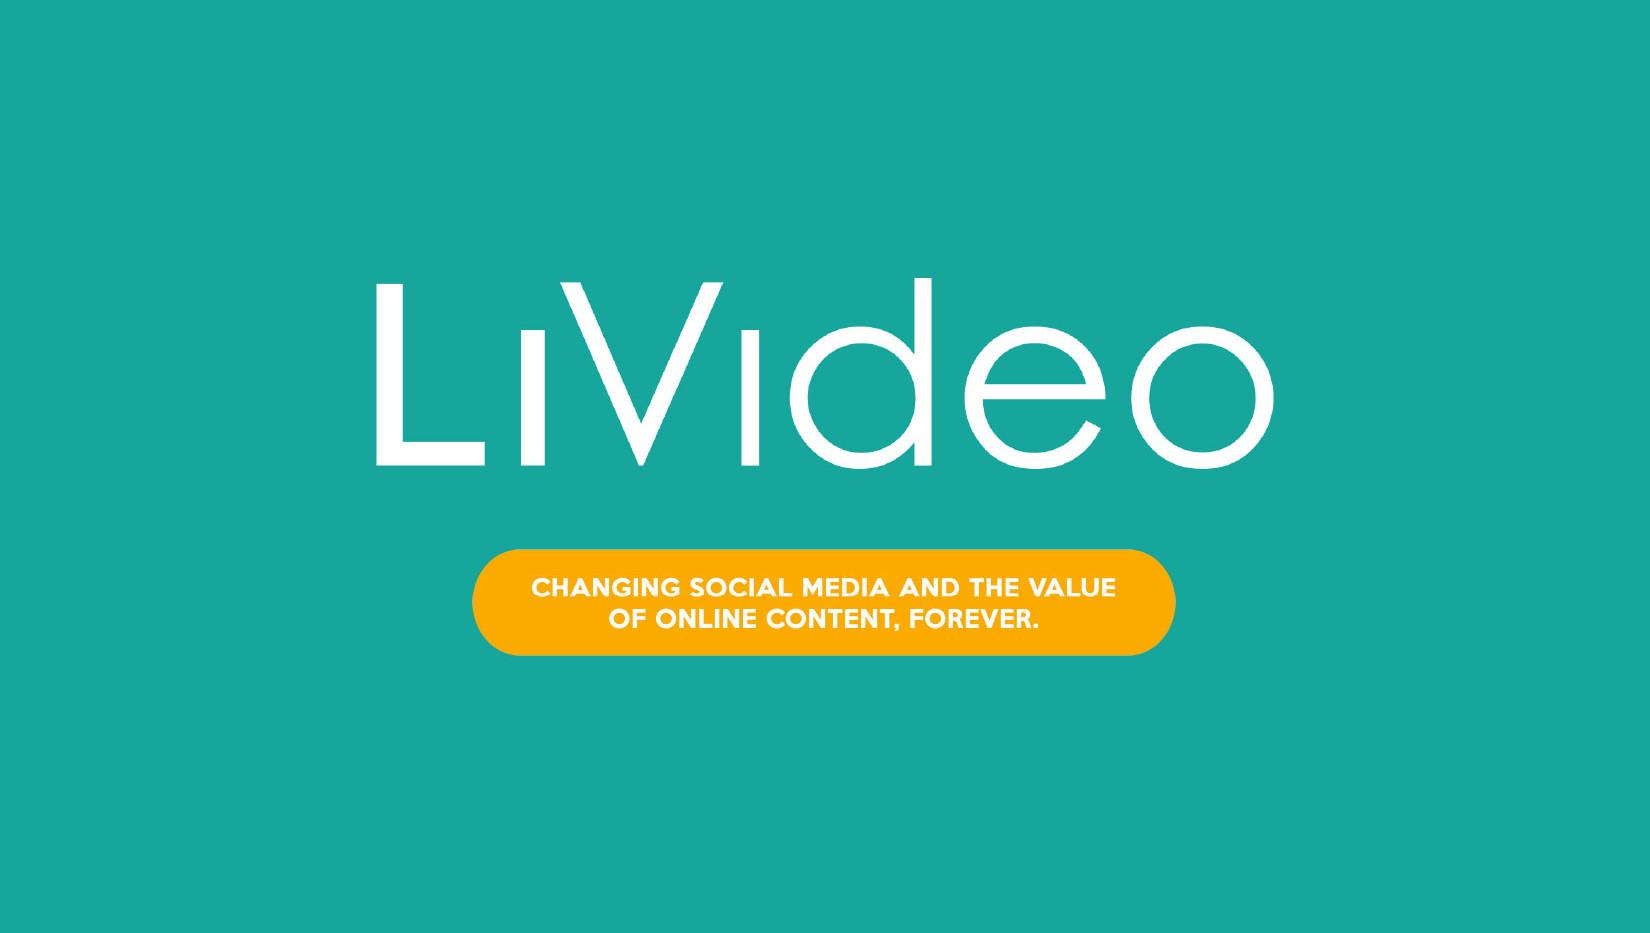 LiVideo-Deck-1.jpg